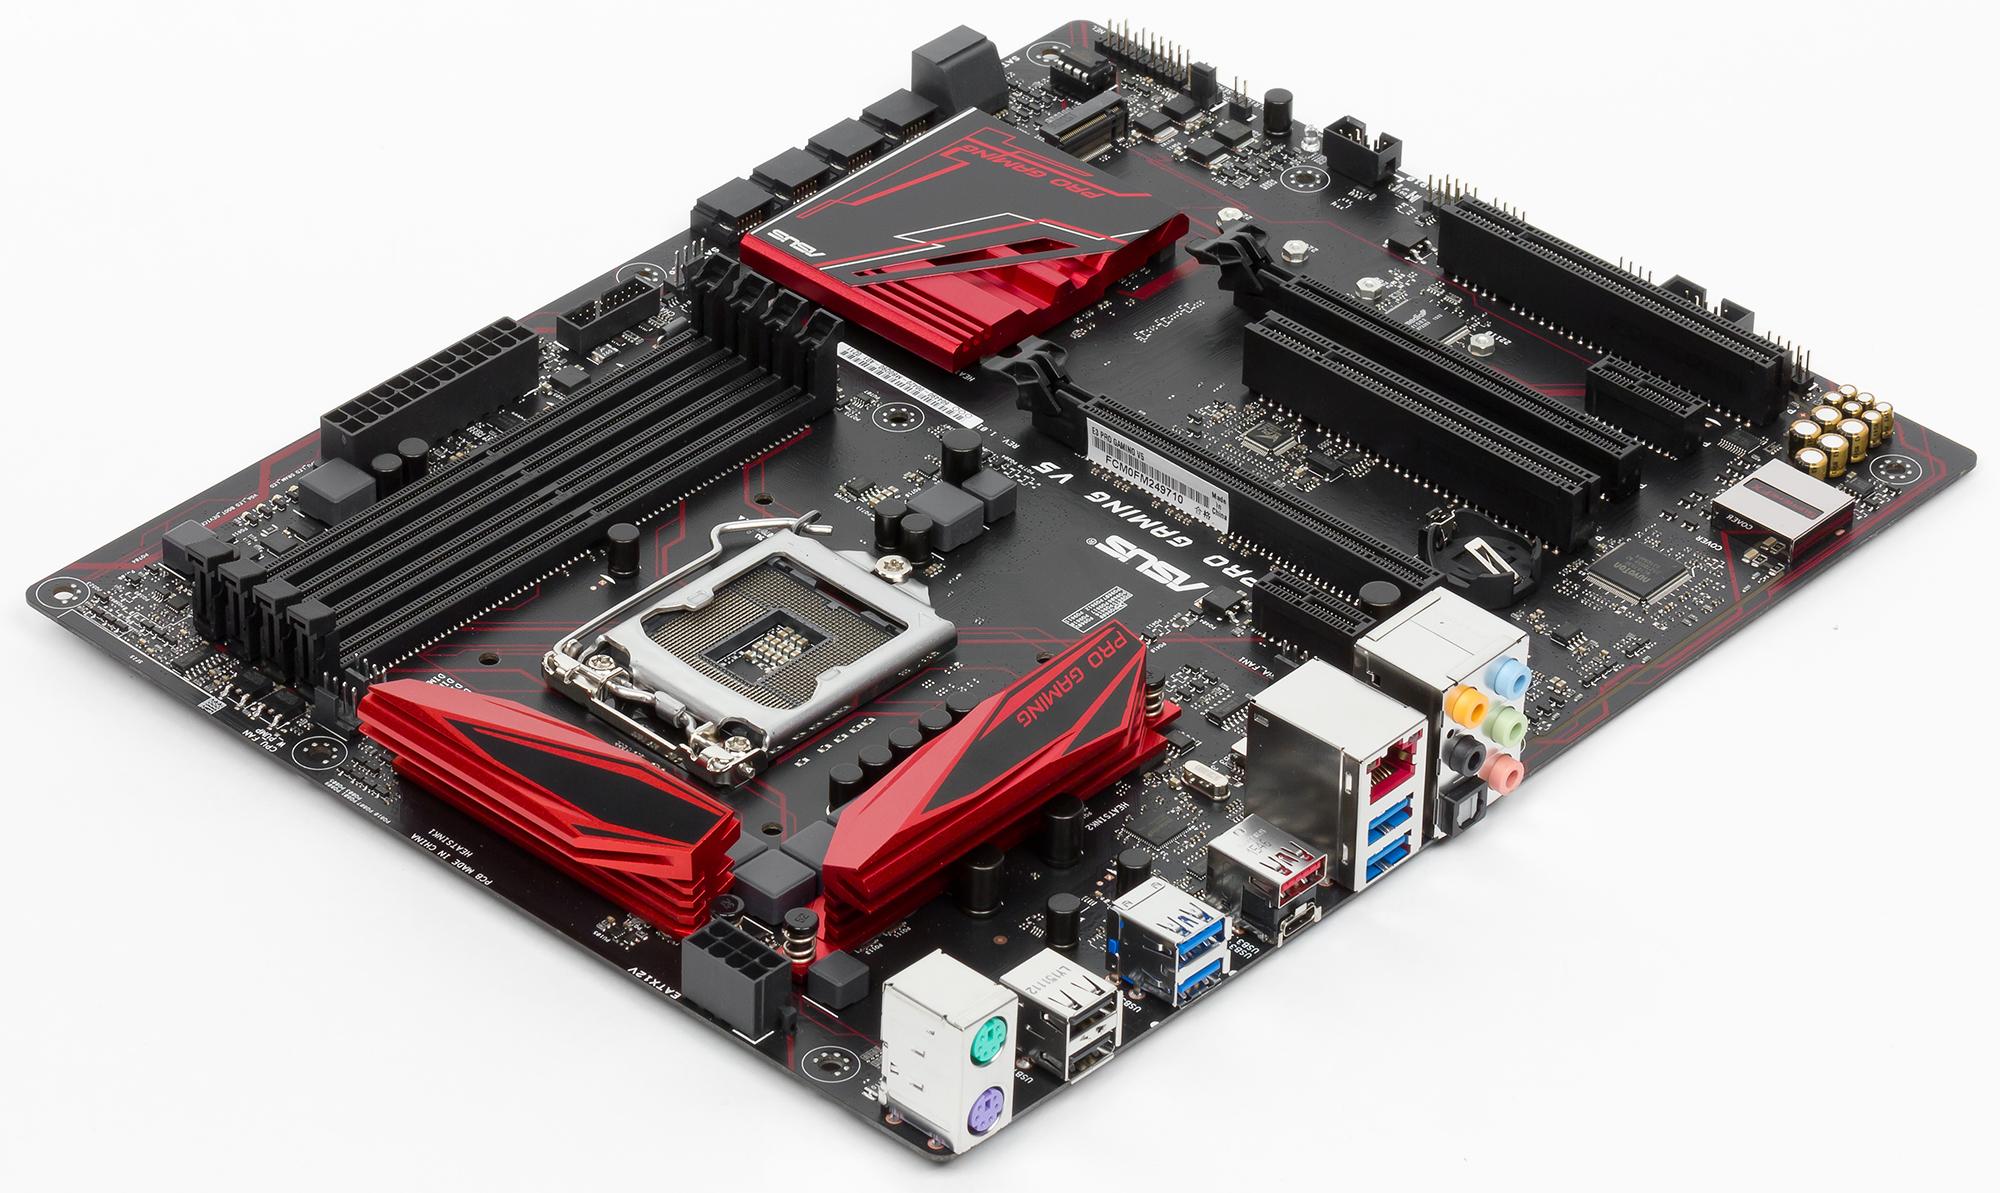 ASUS E3 PRO GAMING V5 ASMEDIA USB 3.1 DRIVER FOR WINDOWS